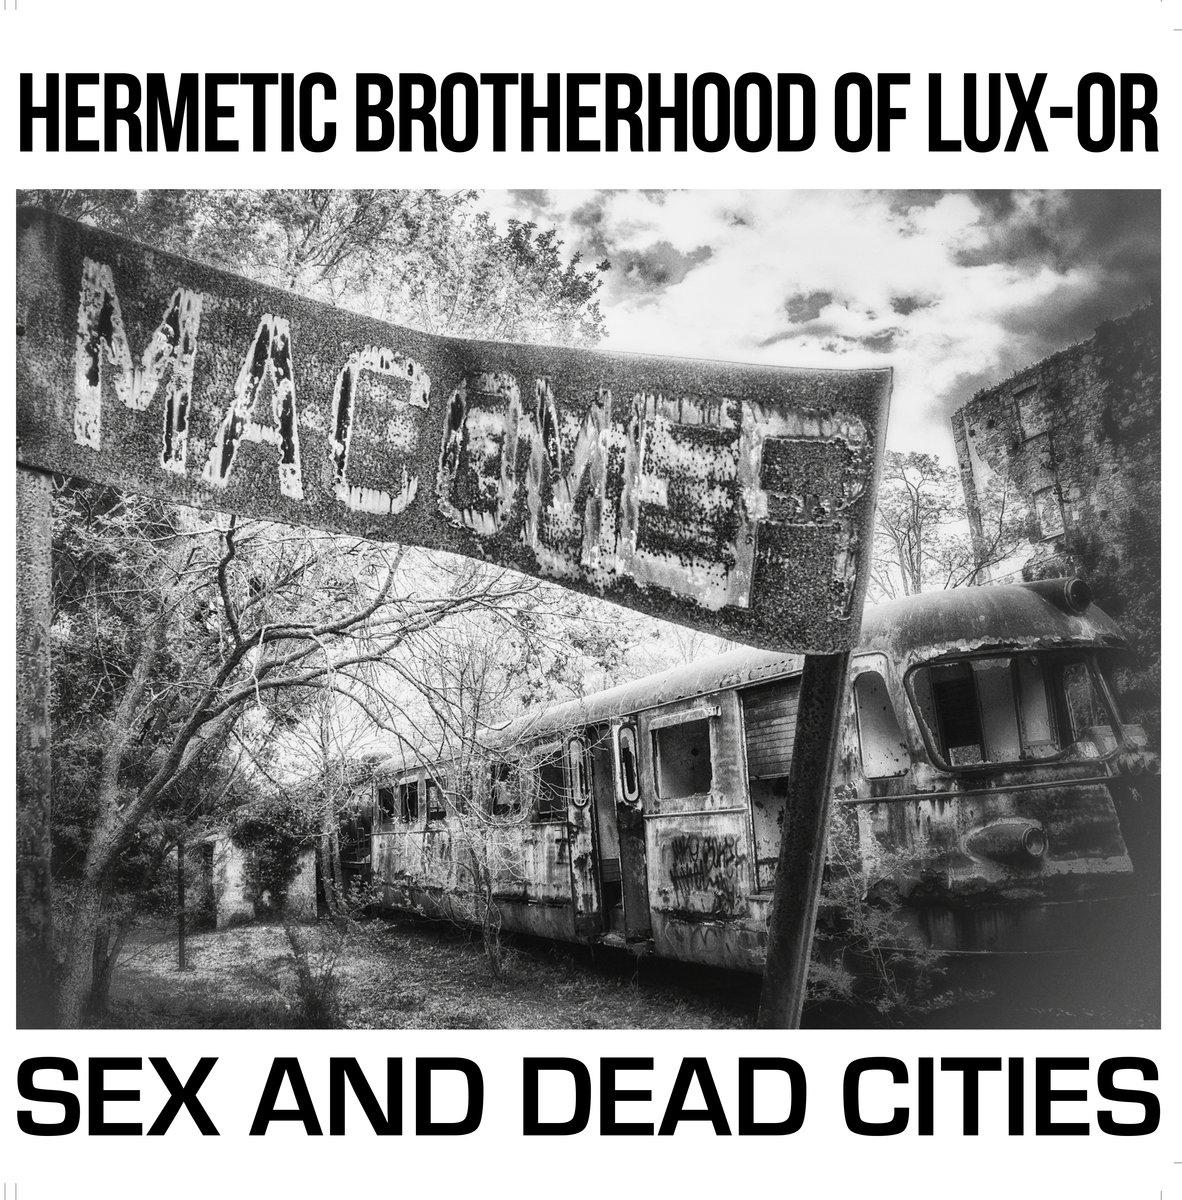 sex and dead cities - hermetic brotherood of luxor - transponsonic - sa scena sarda - 2019 - mirko santoru